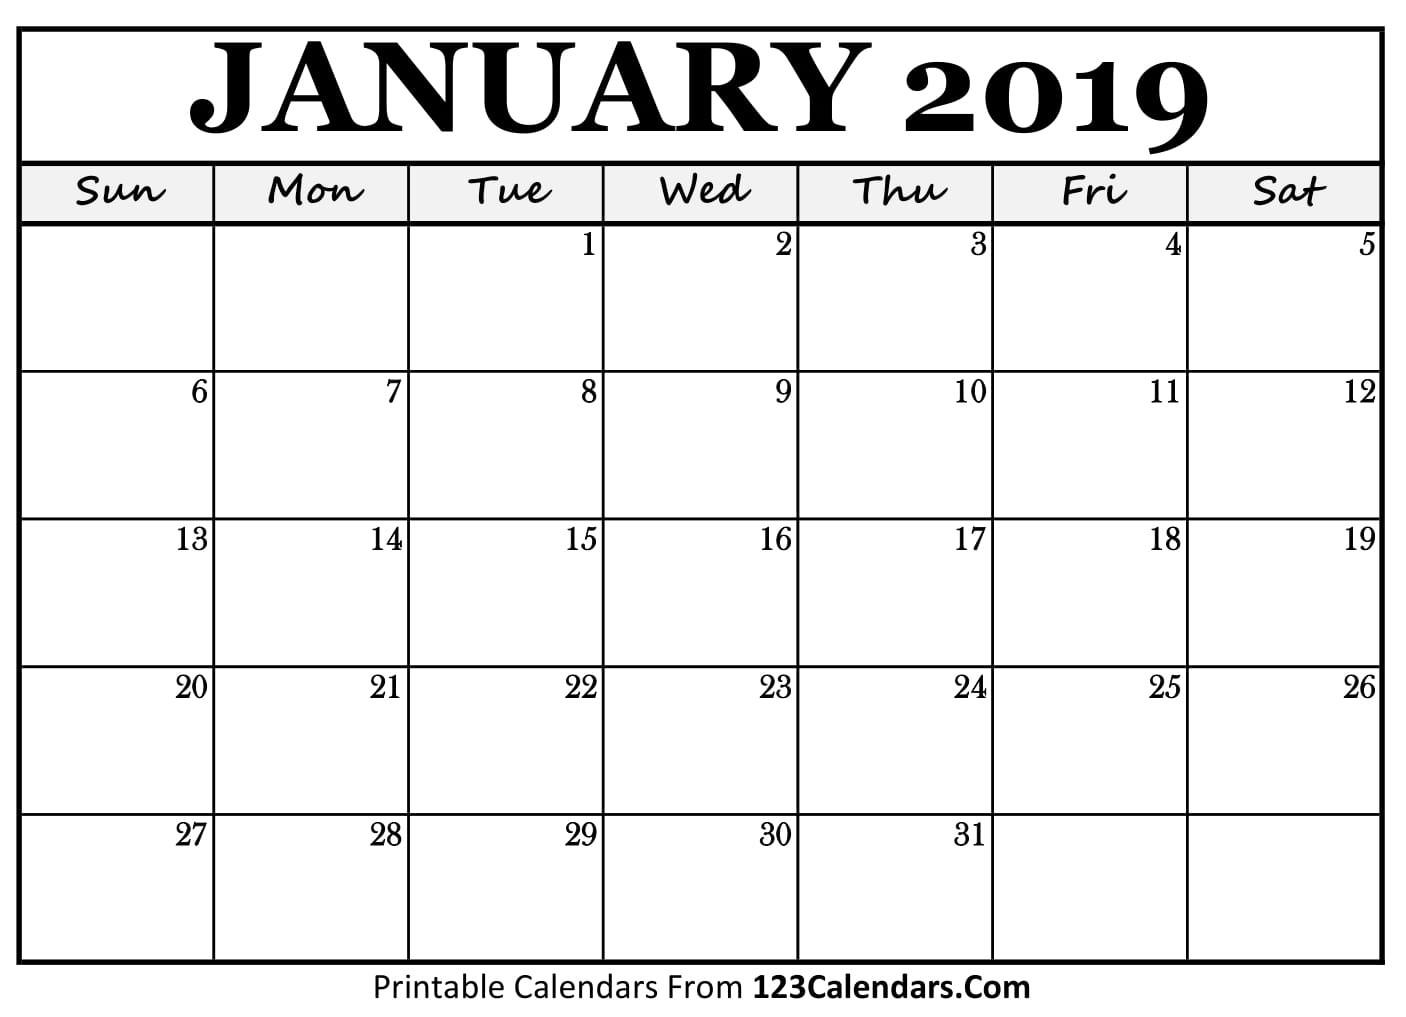 Free Printable Calendar | 123Calendars  Ber 2020 Full Page Calendar